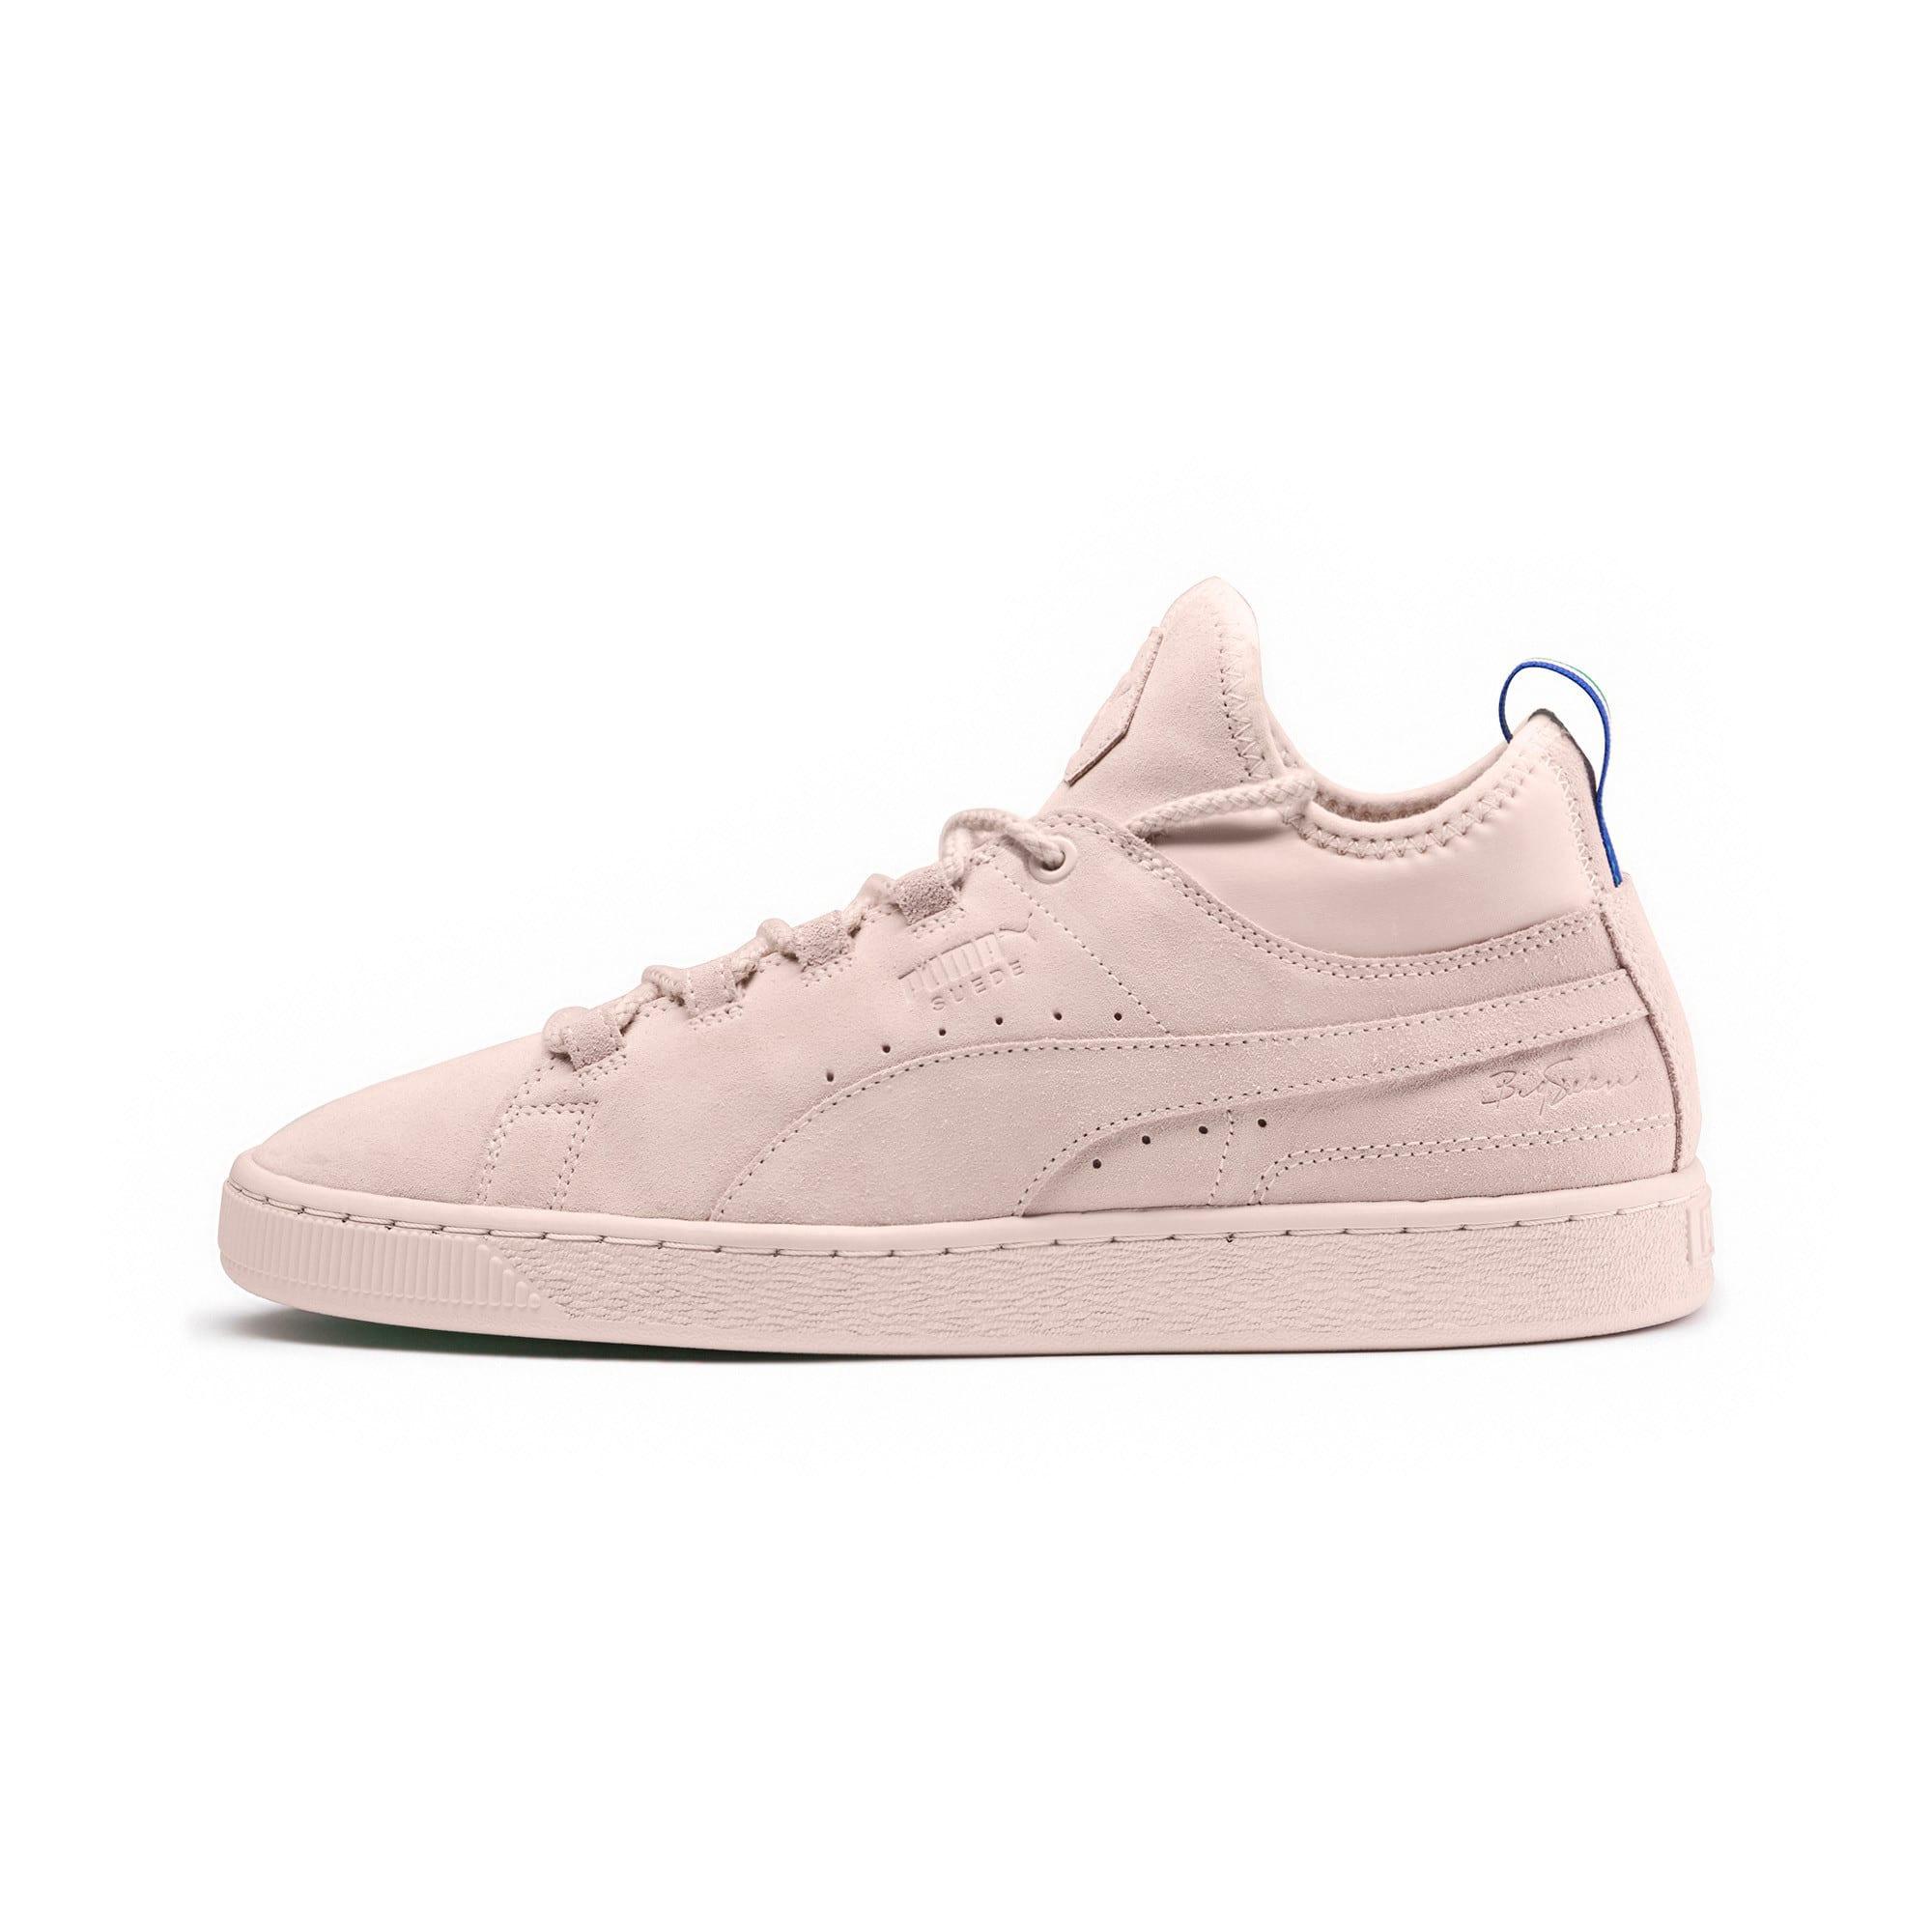 purchase cheap f91f5 a32dd PUMA x BIG SEAN Suede Mid Sneakers